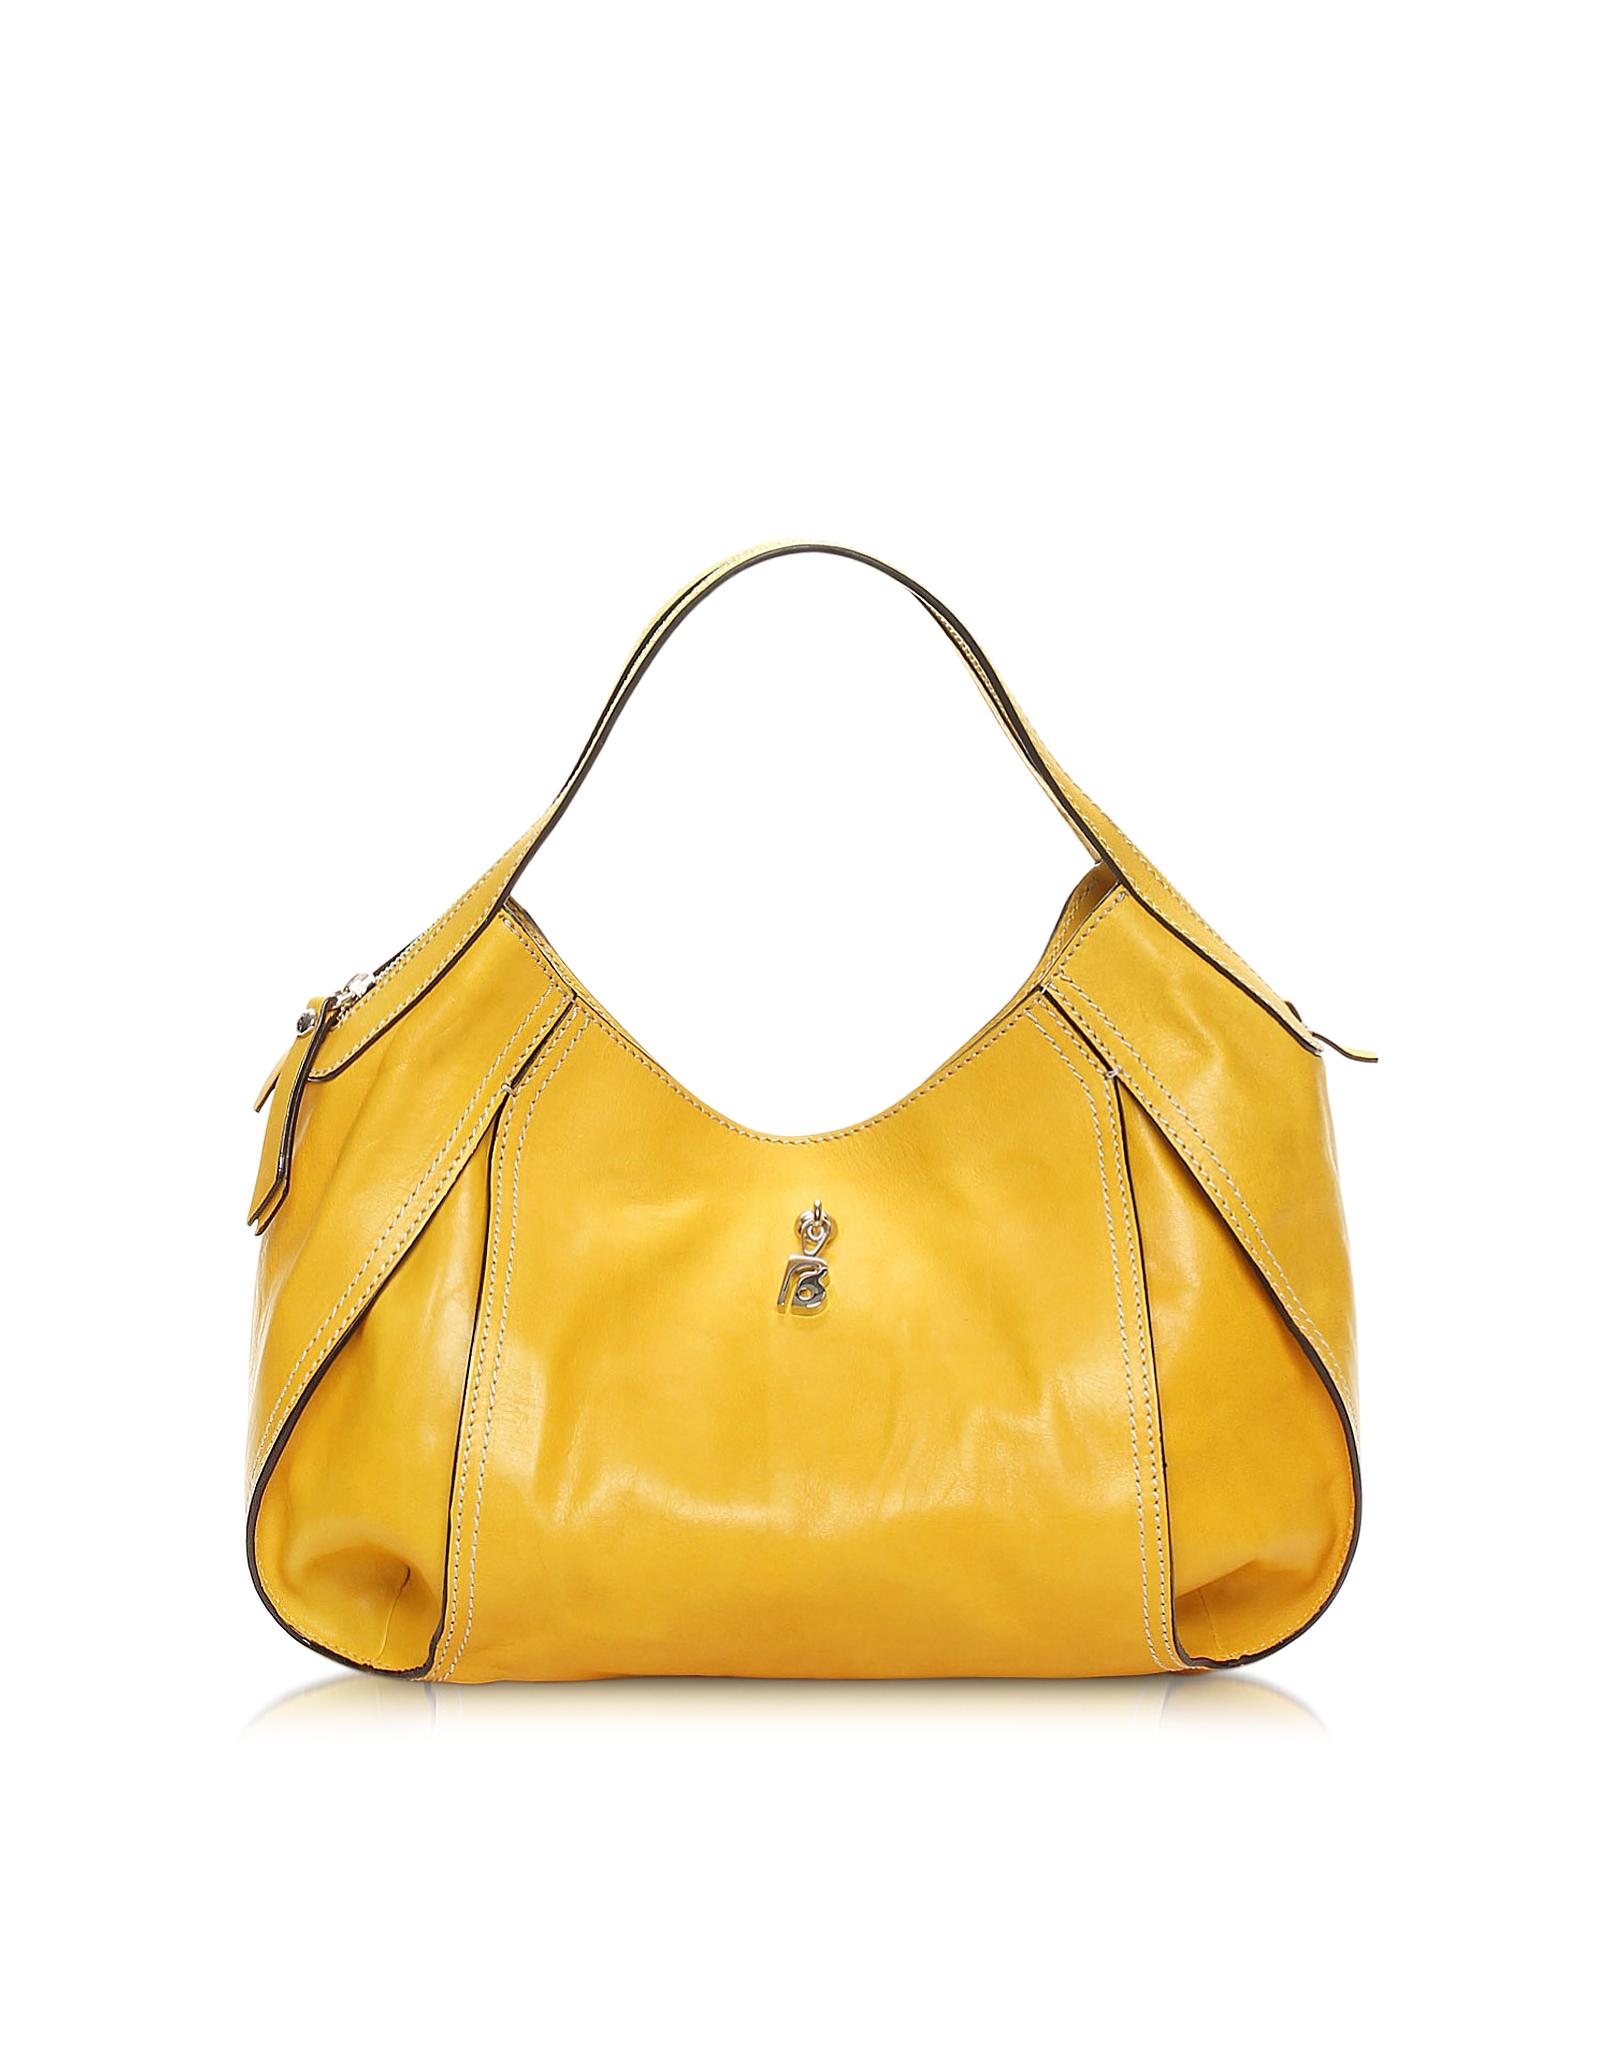 Lyst - Francesco Biasia Copacabana Amber Yellow Leather Shoulder Bag ... ad1e320b3bdb3